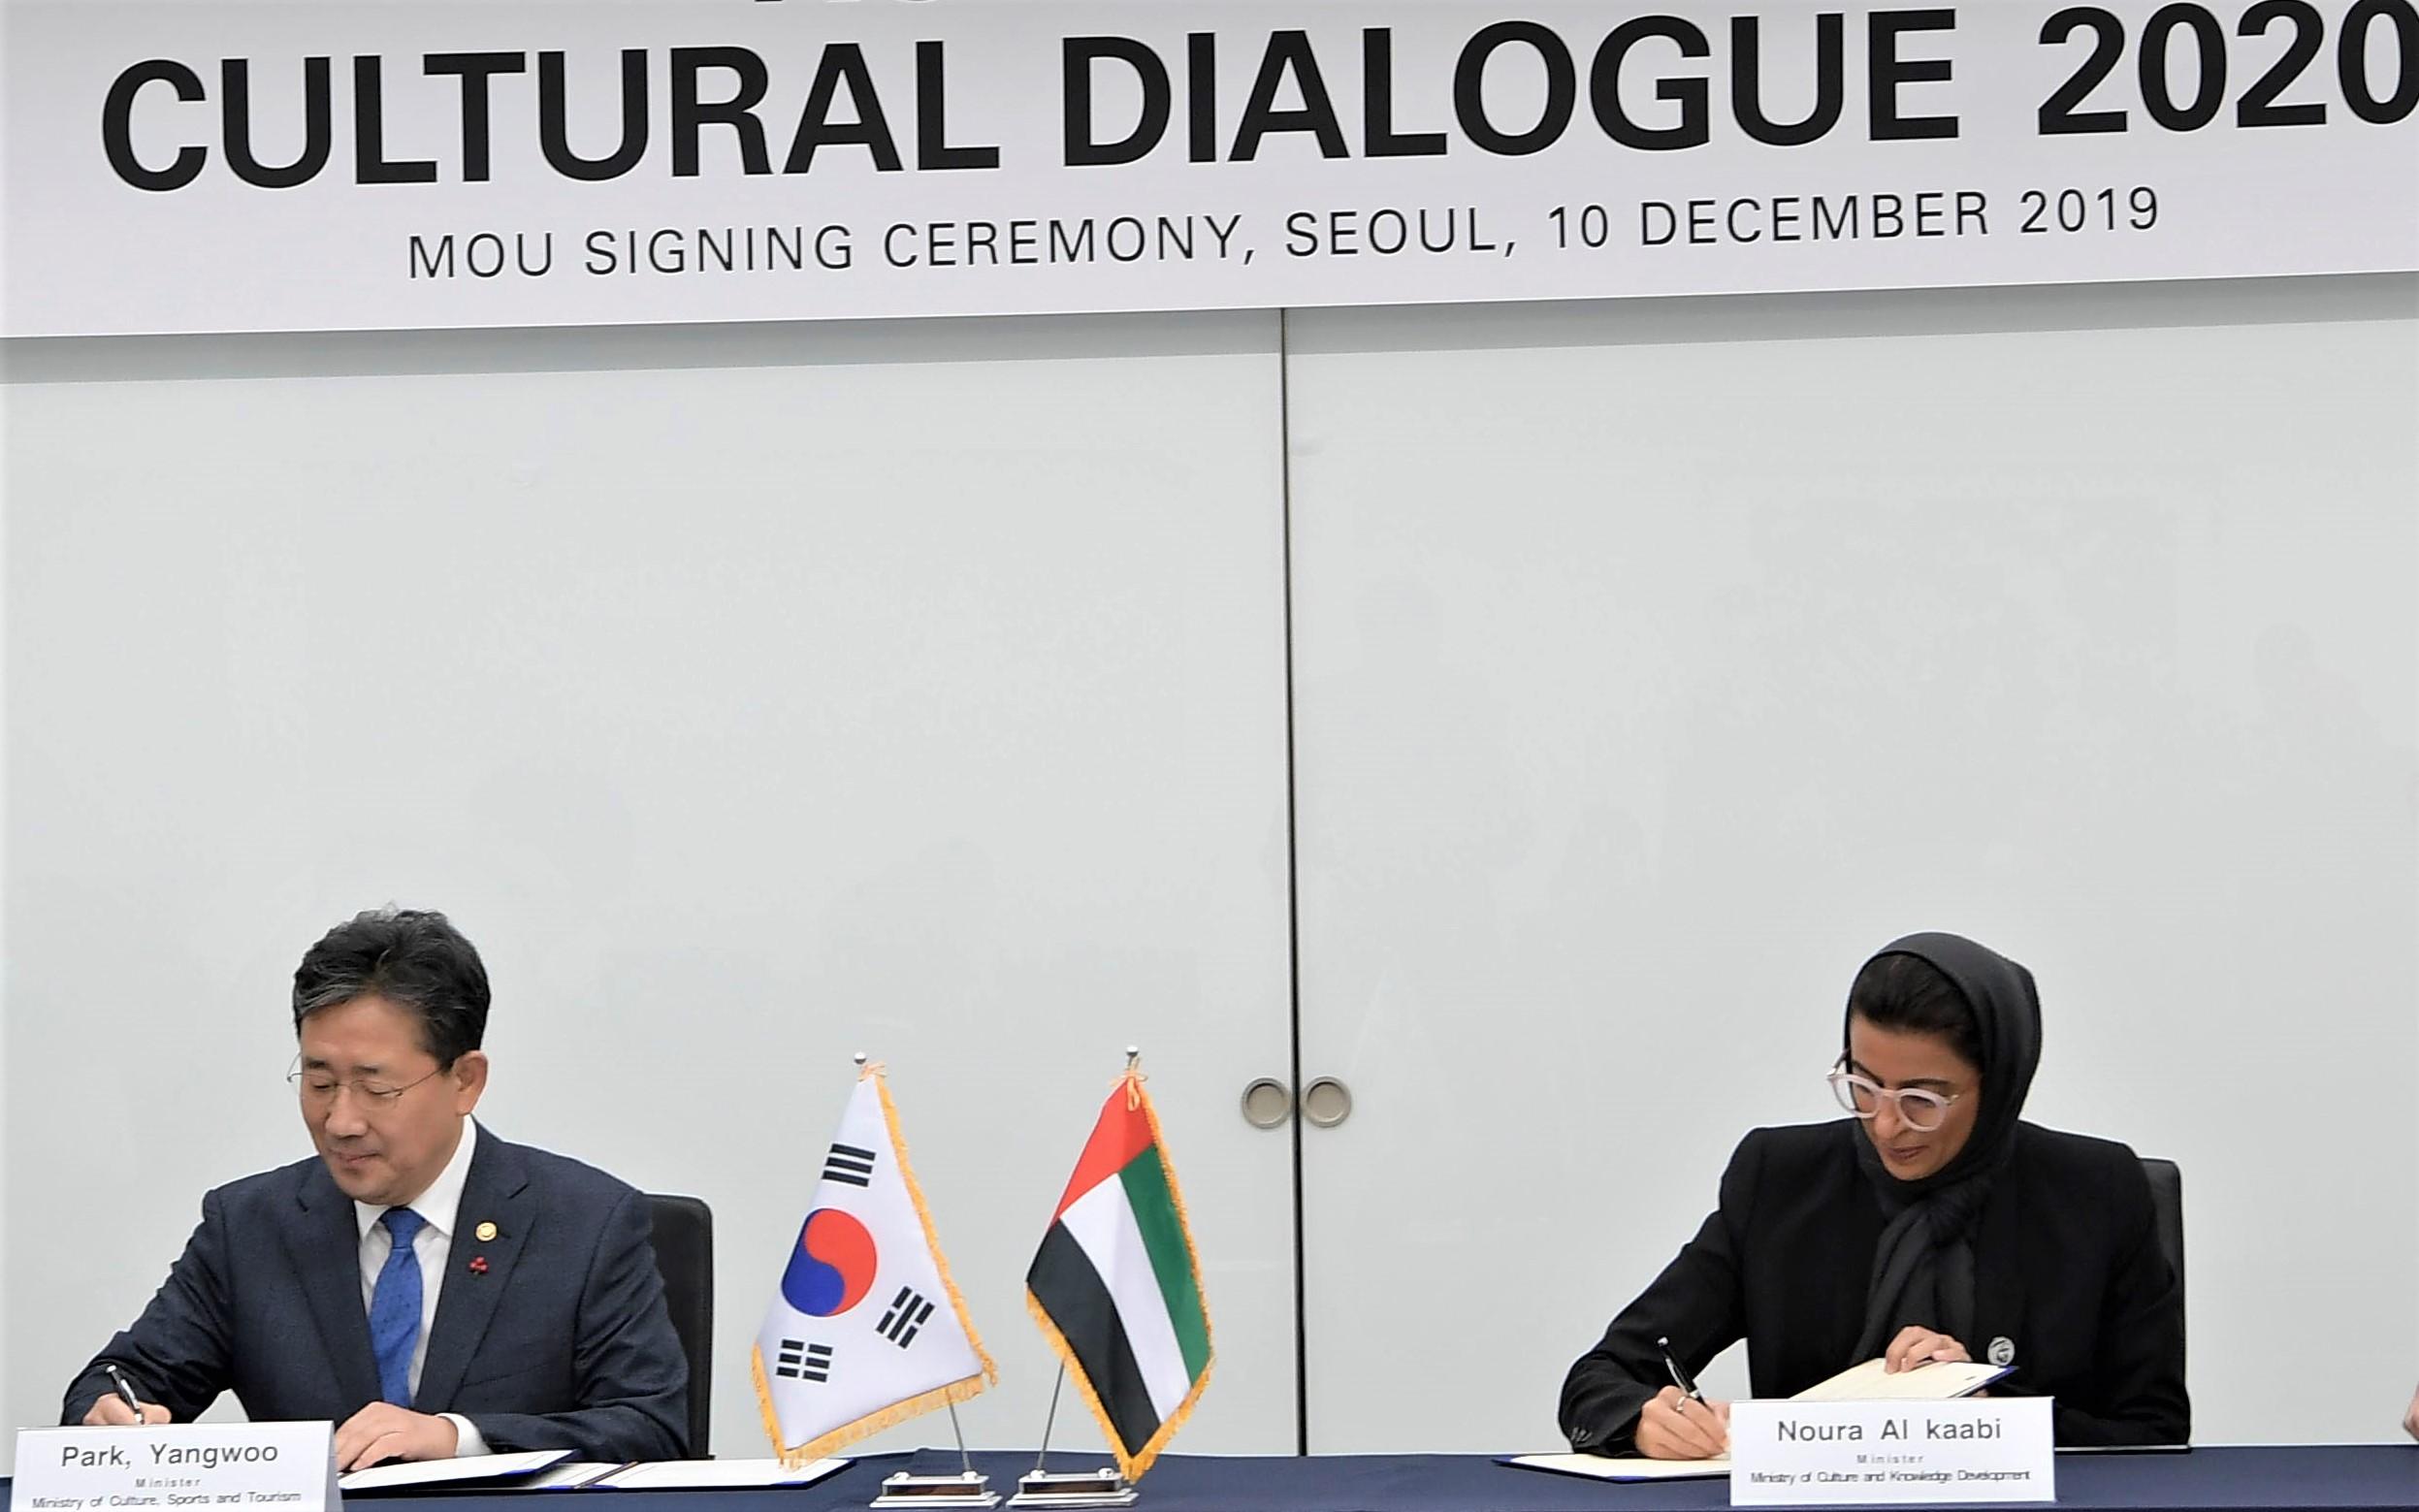 uae-korea cultural dialogue 2020 announced in seoul 3